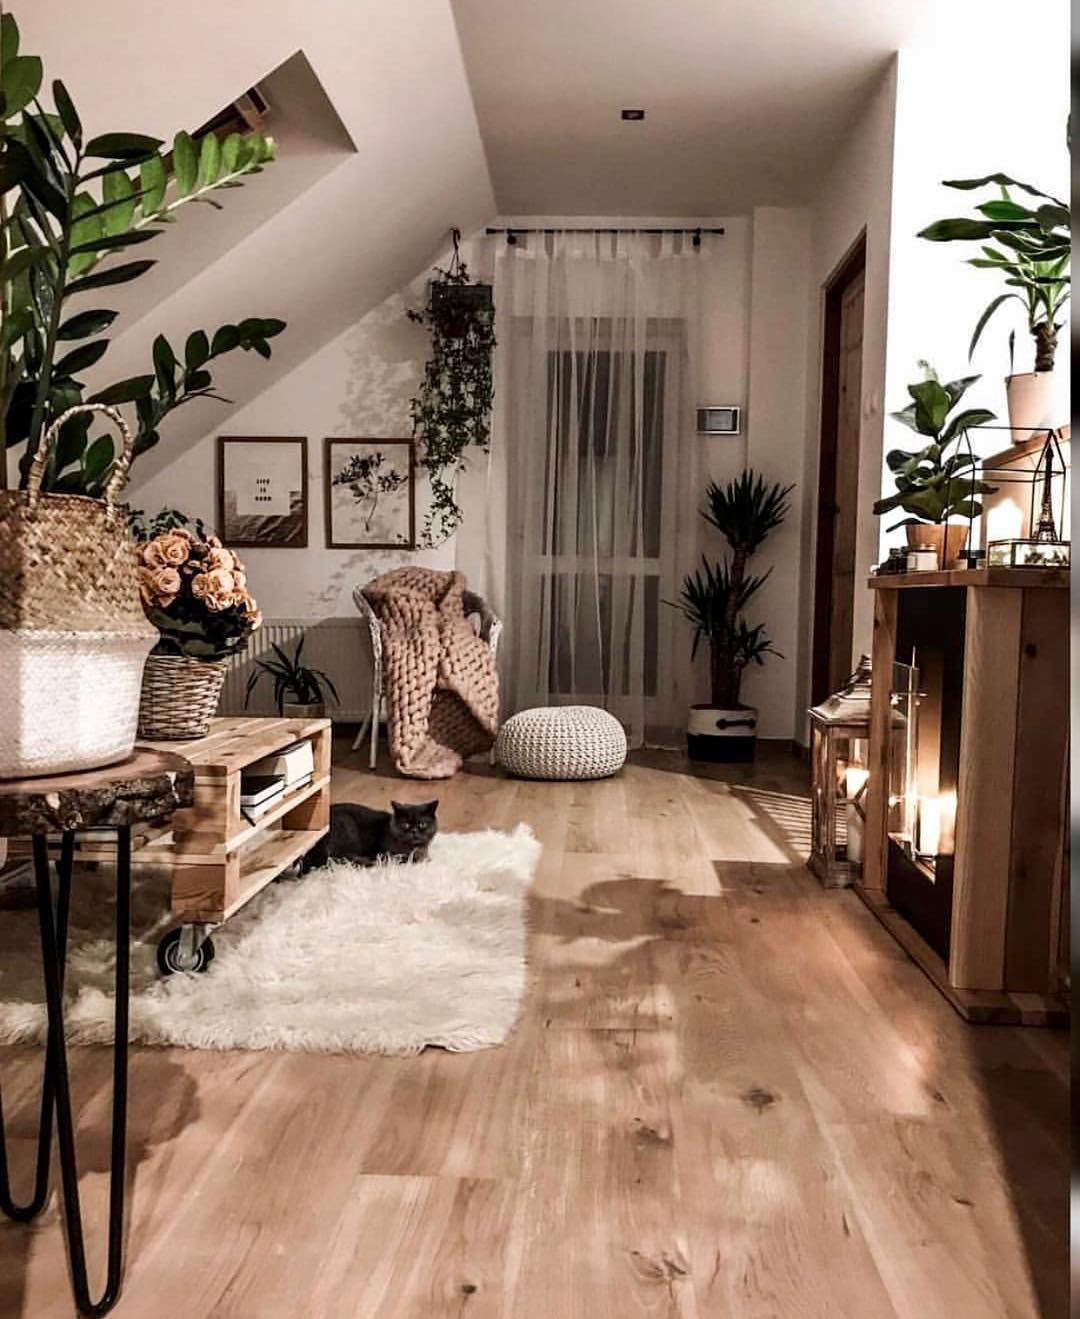 "Photo of Interior Design & Decor on Instagram: ""Loving there neutral vibes 🧡✨🌿🐈😍 Follow @gypsytribex @tatiana_home_decor"""